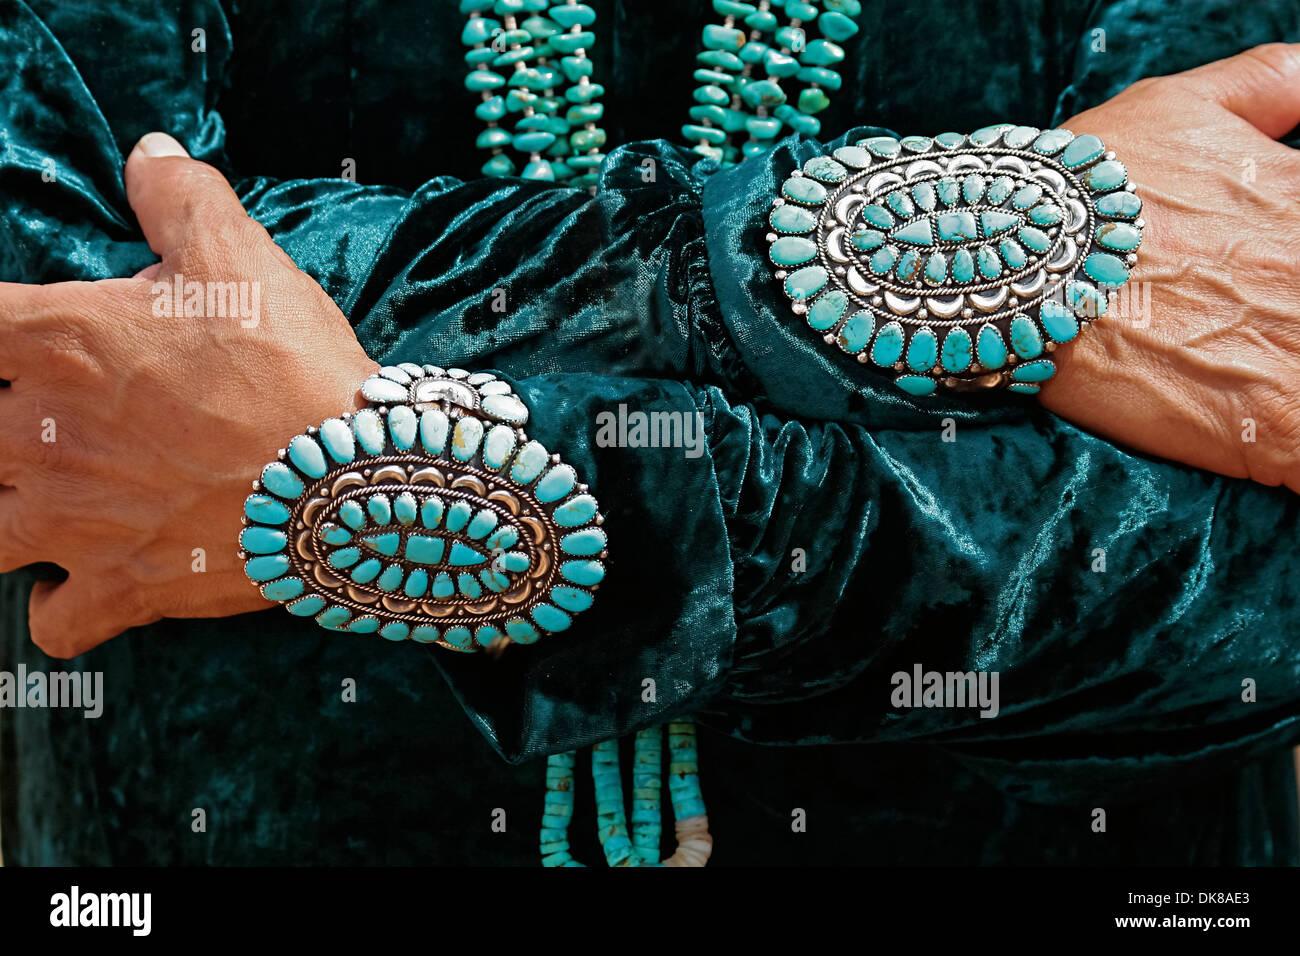 New mexico turquoise stock photos new mexico turquoise for Turquoise jewelry taos new mexico